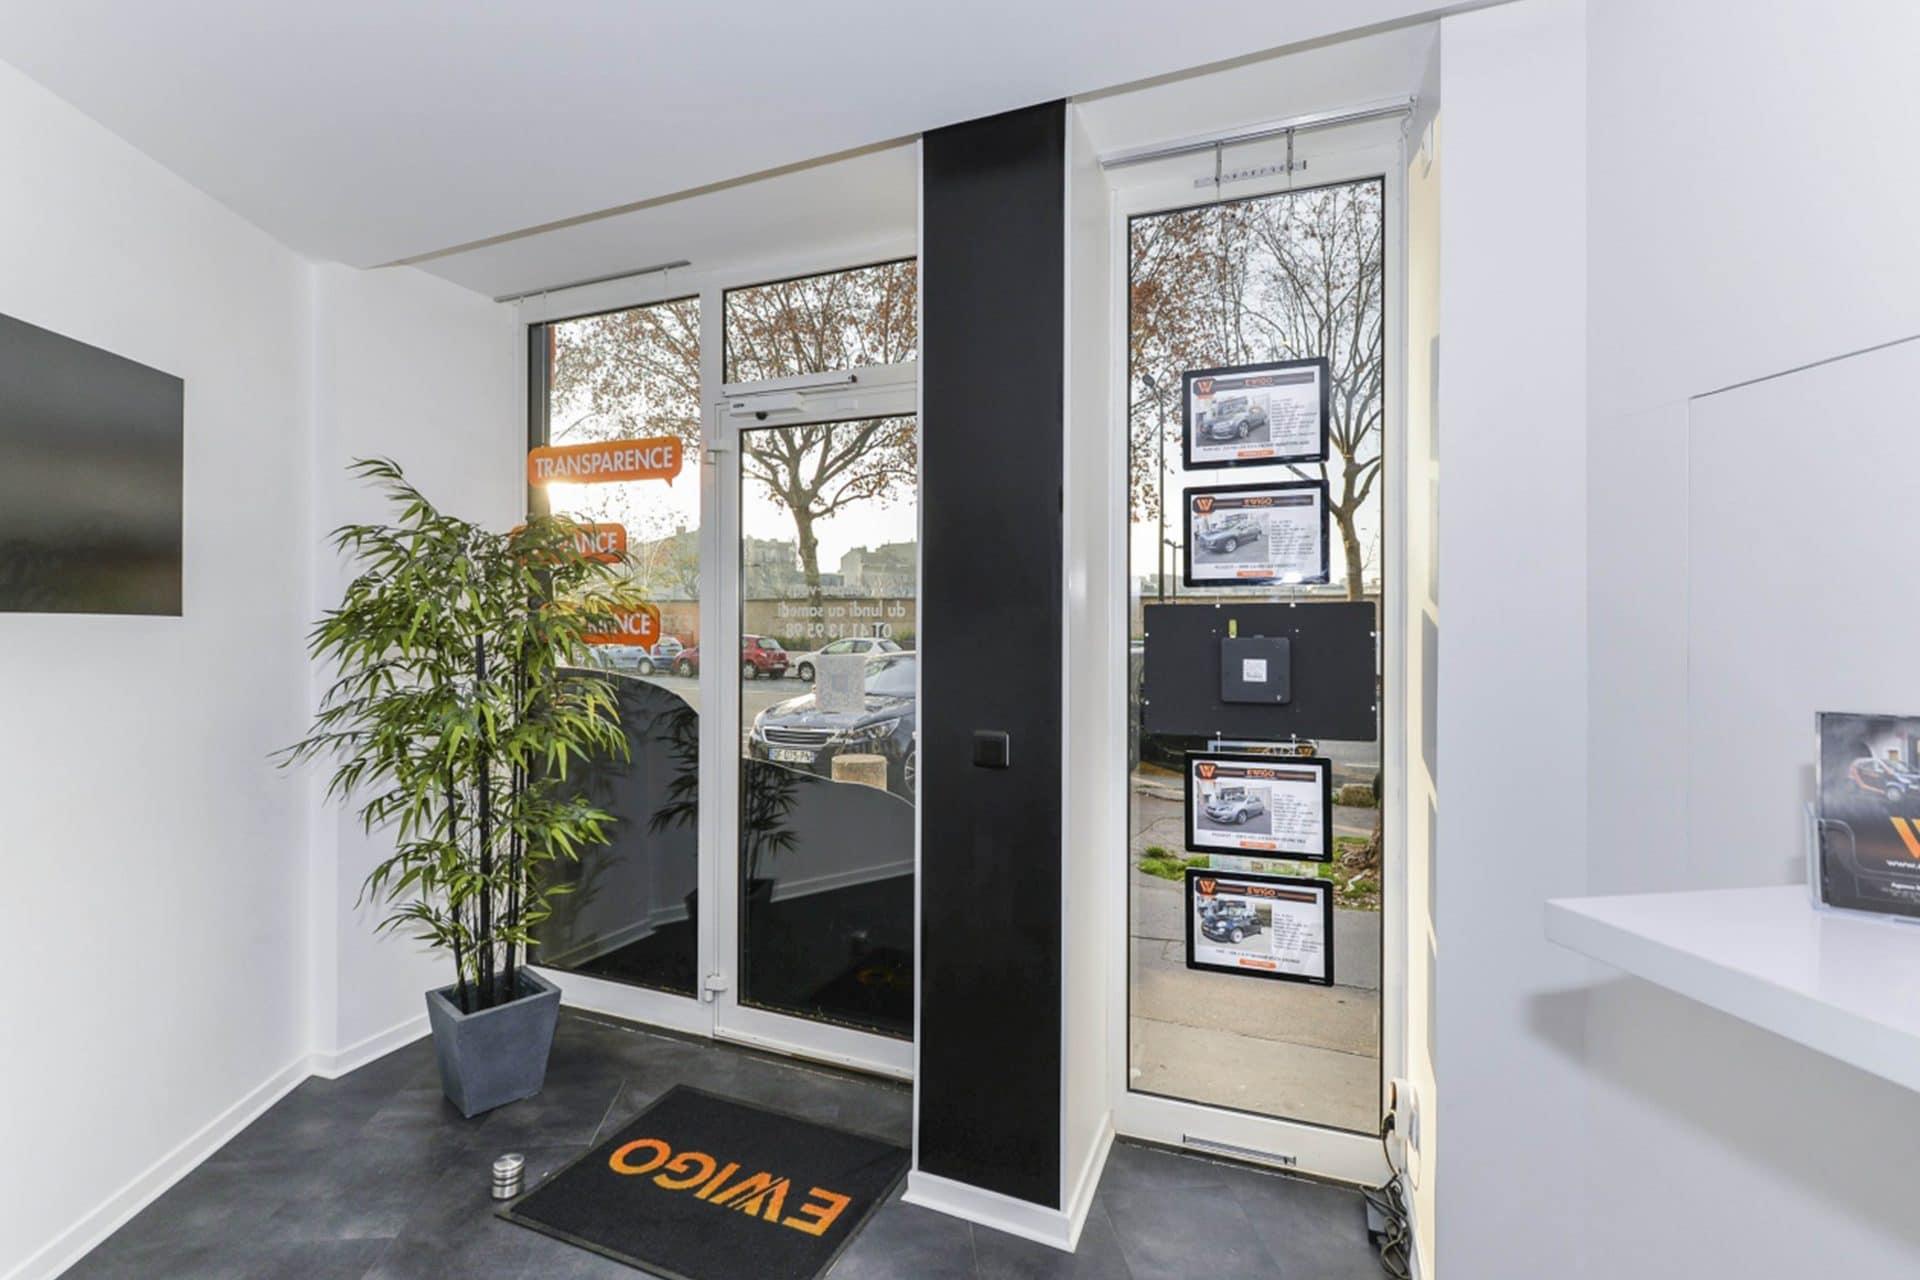 ewigo vitrinemedia vitrine lumineuse interieur etude de cas